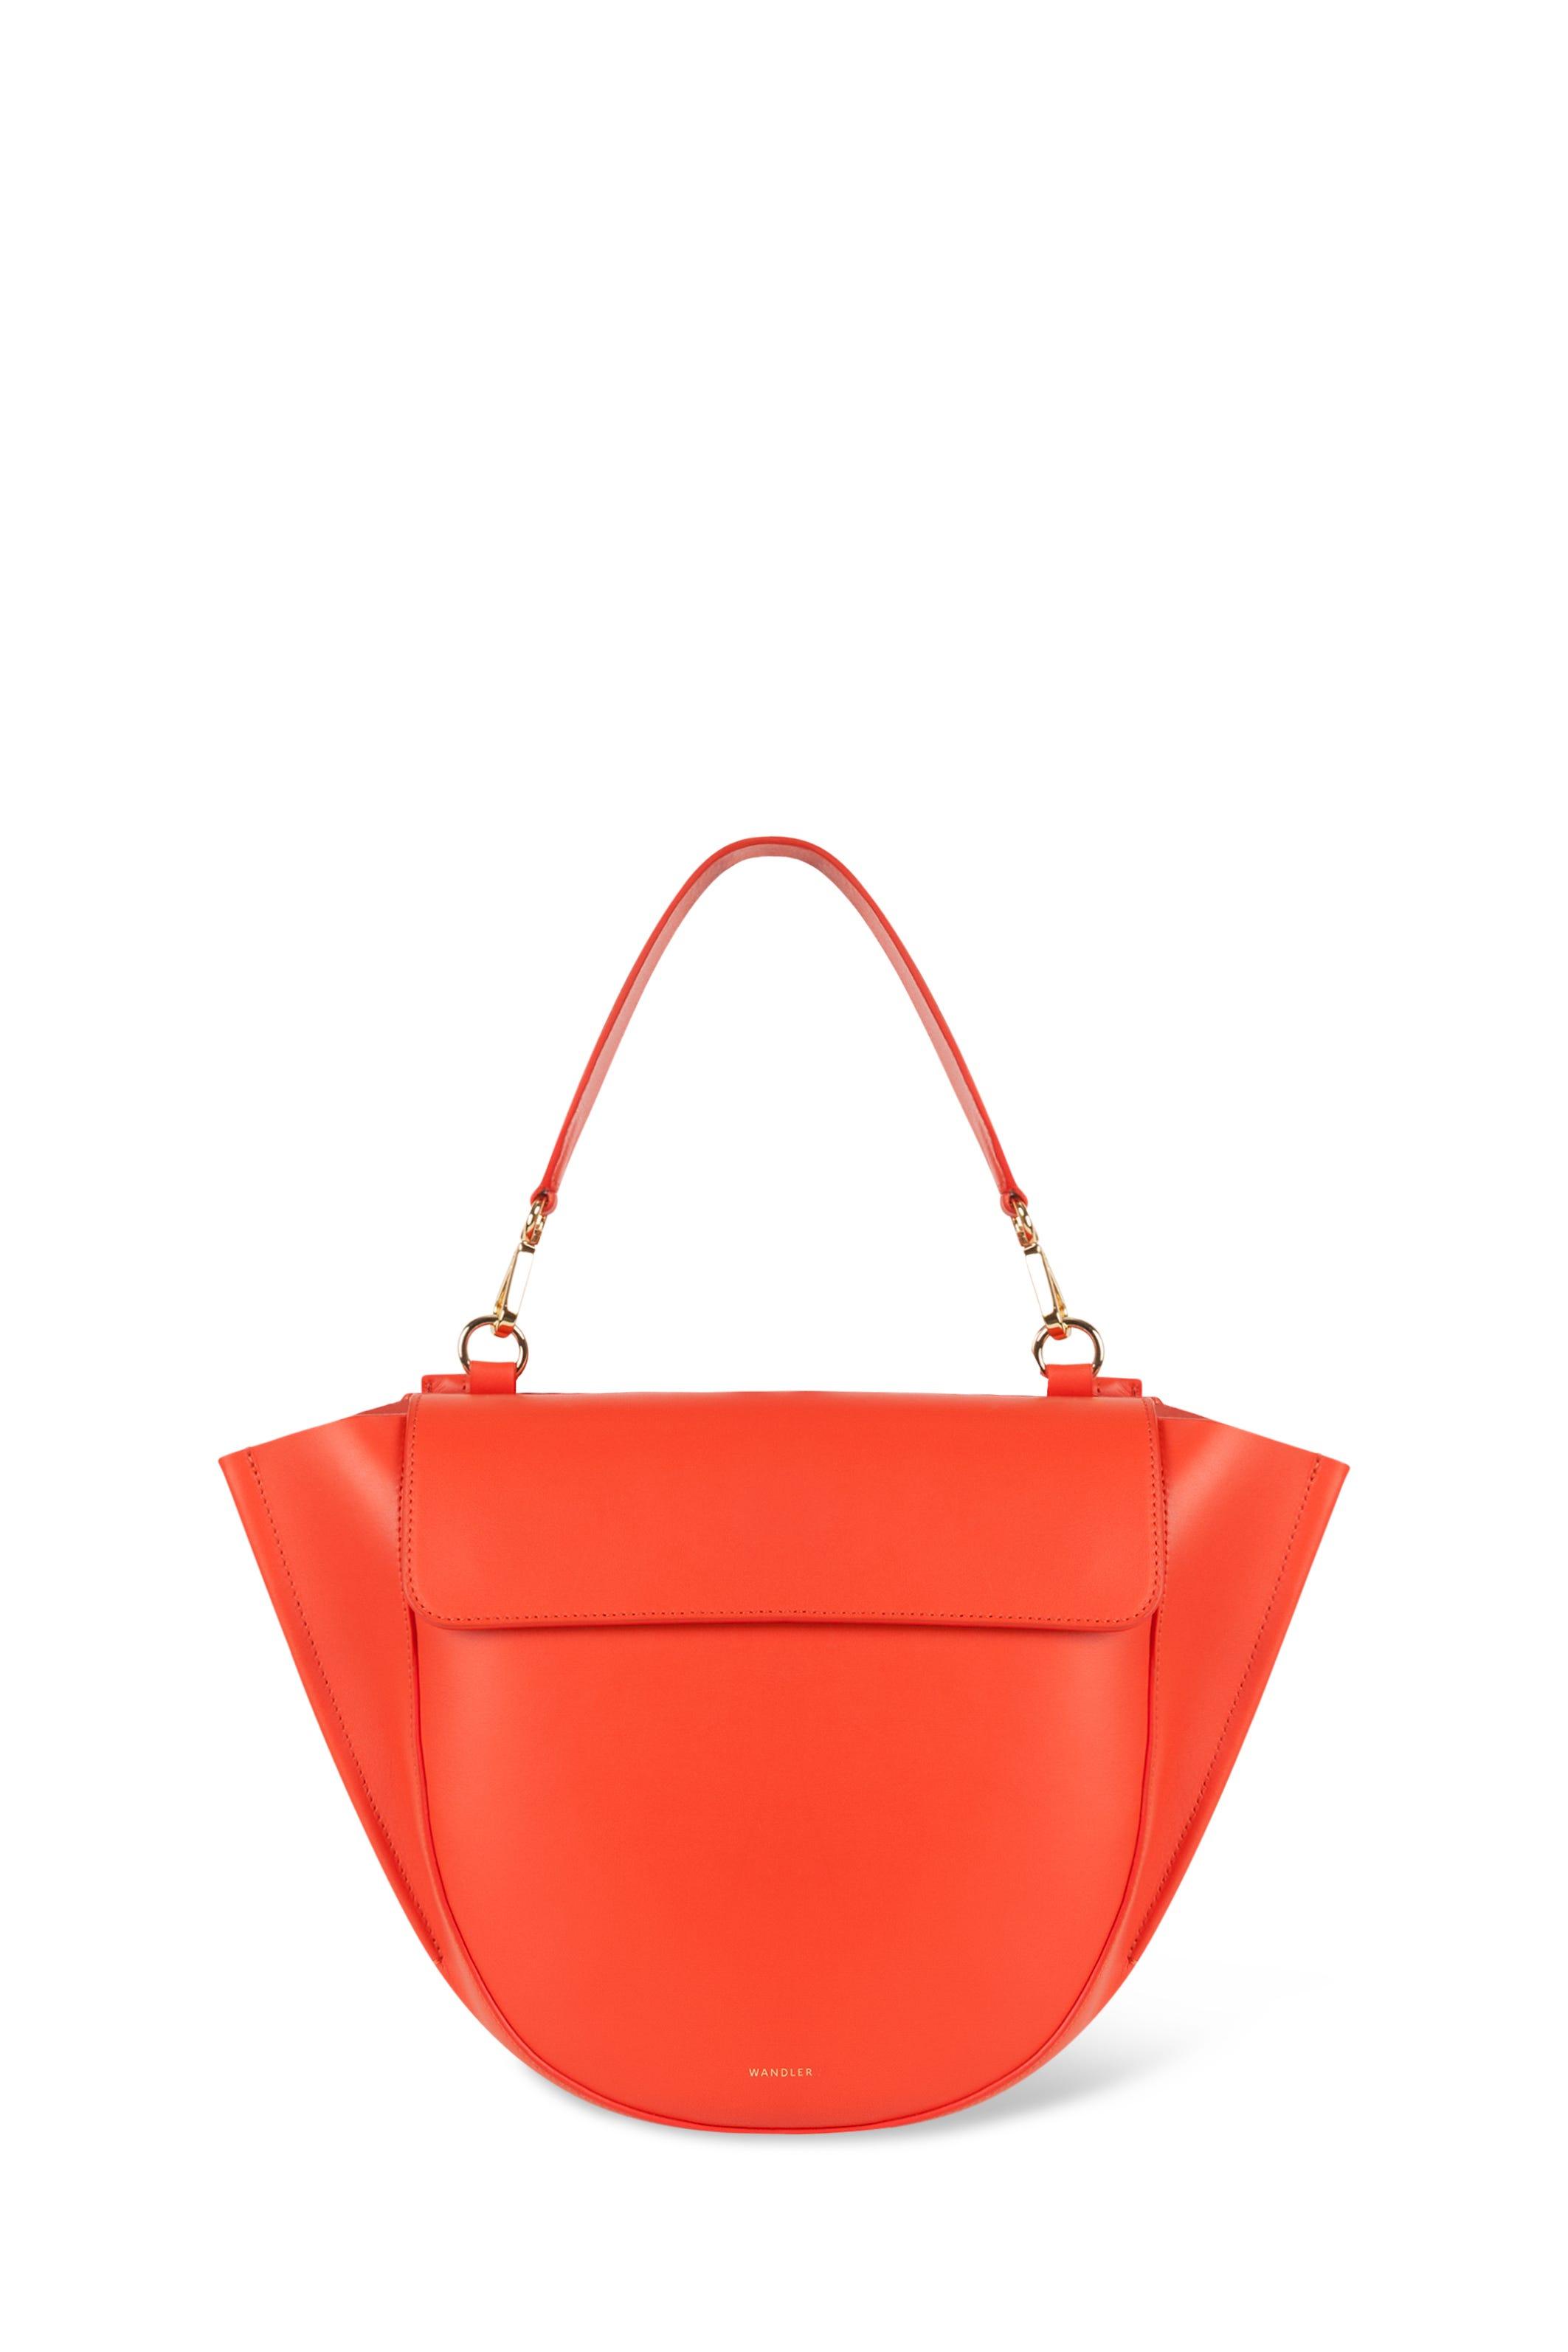 ae2ce979ab7b What Makes An  It  Bag – Cult Bag Brands